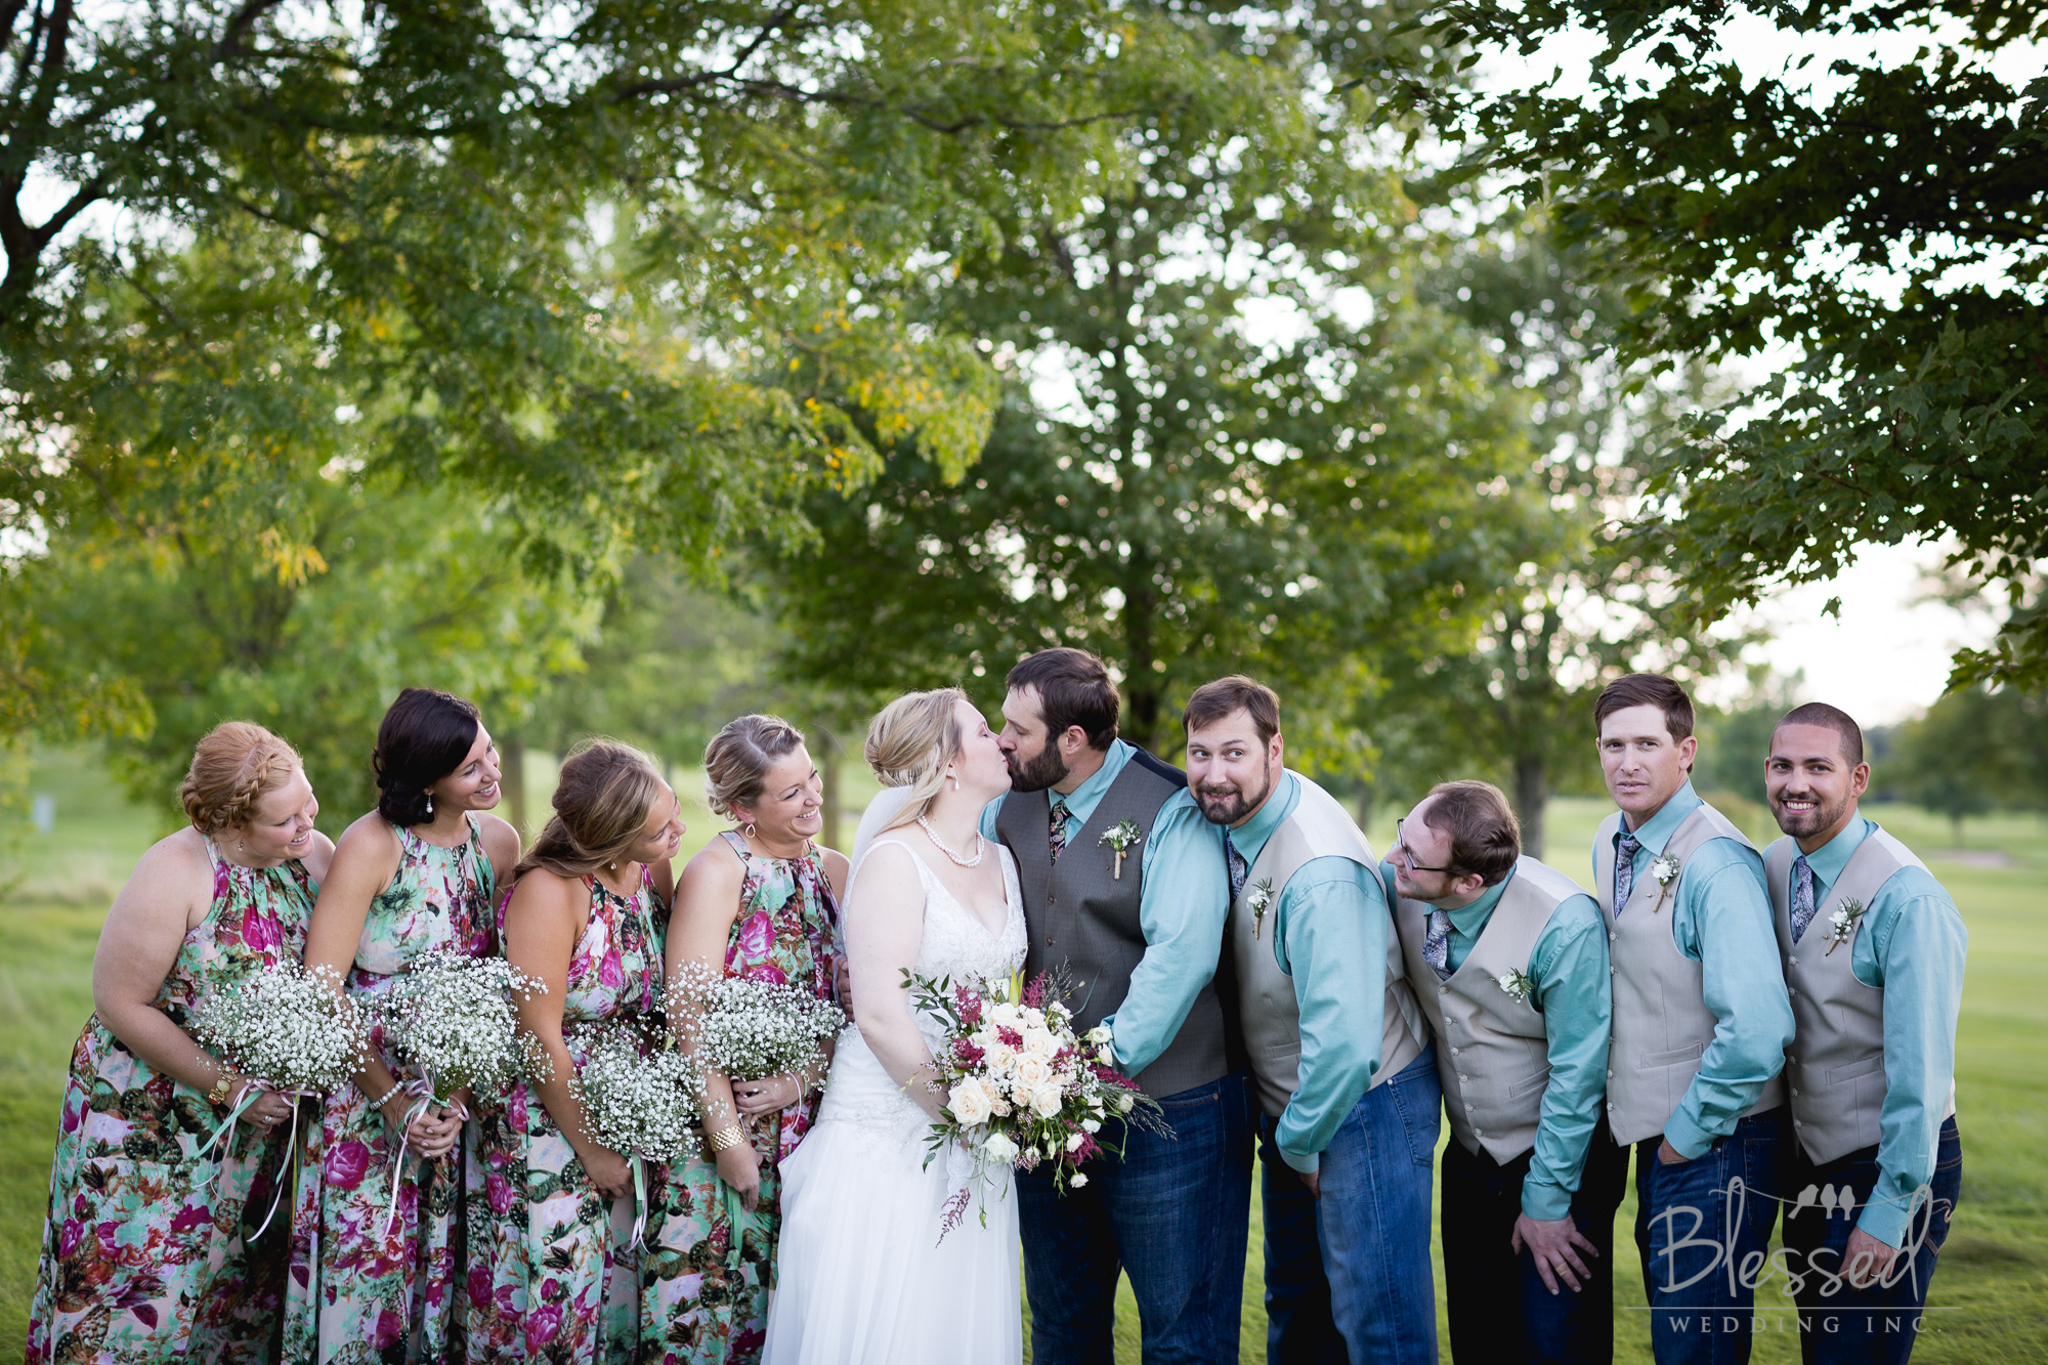 Destination Wedding Photography Minnesota By Blessed Wedding Photographers-102.jpg